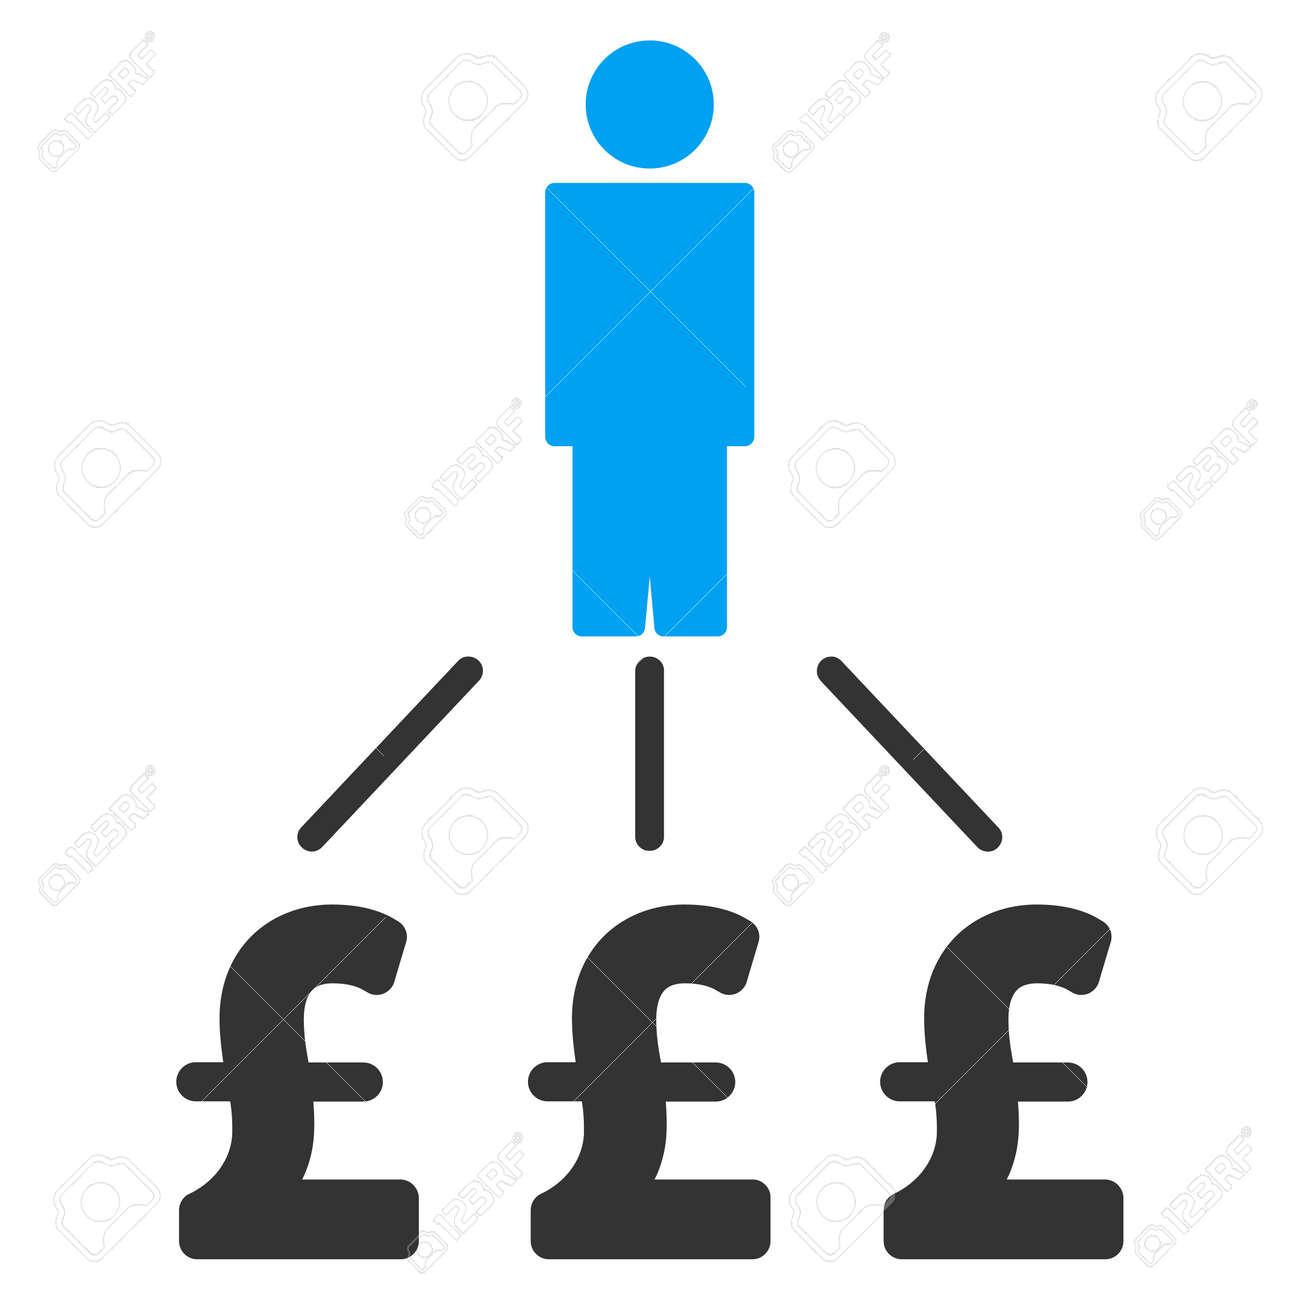 person pound expenses vector icon person pound expenses icon symbol person pound expenses icon